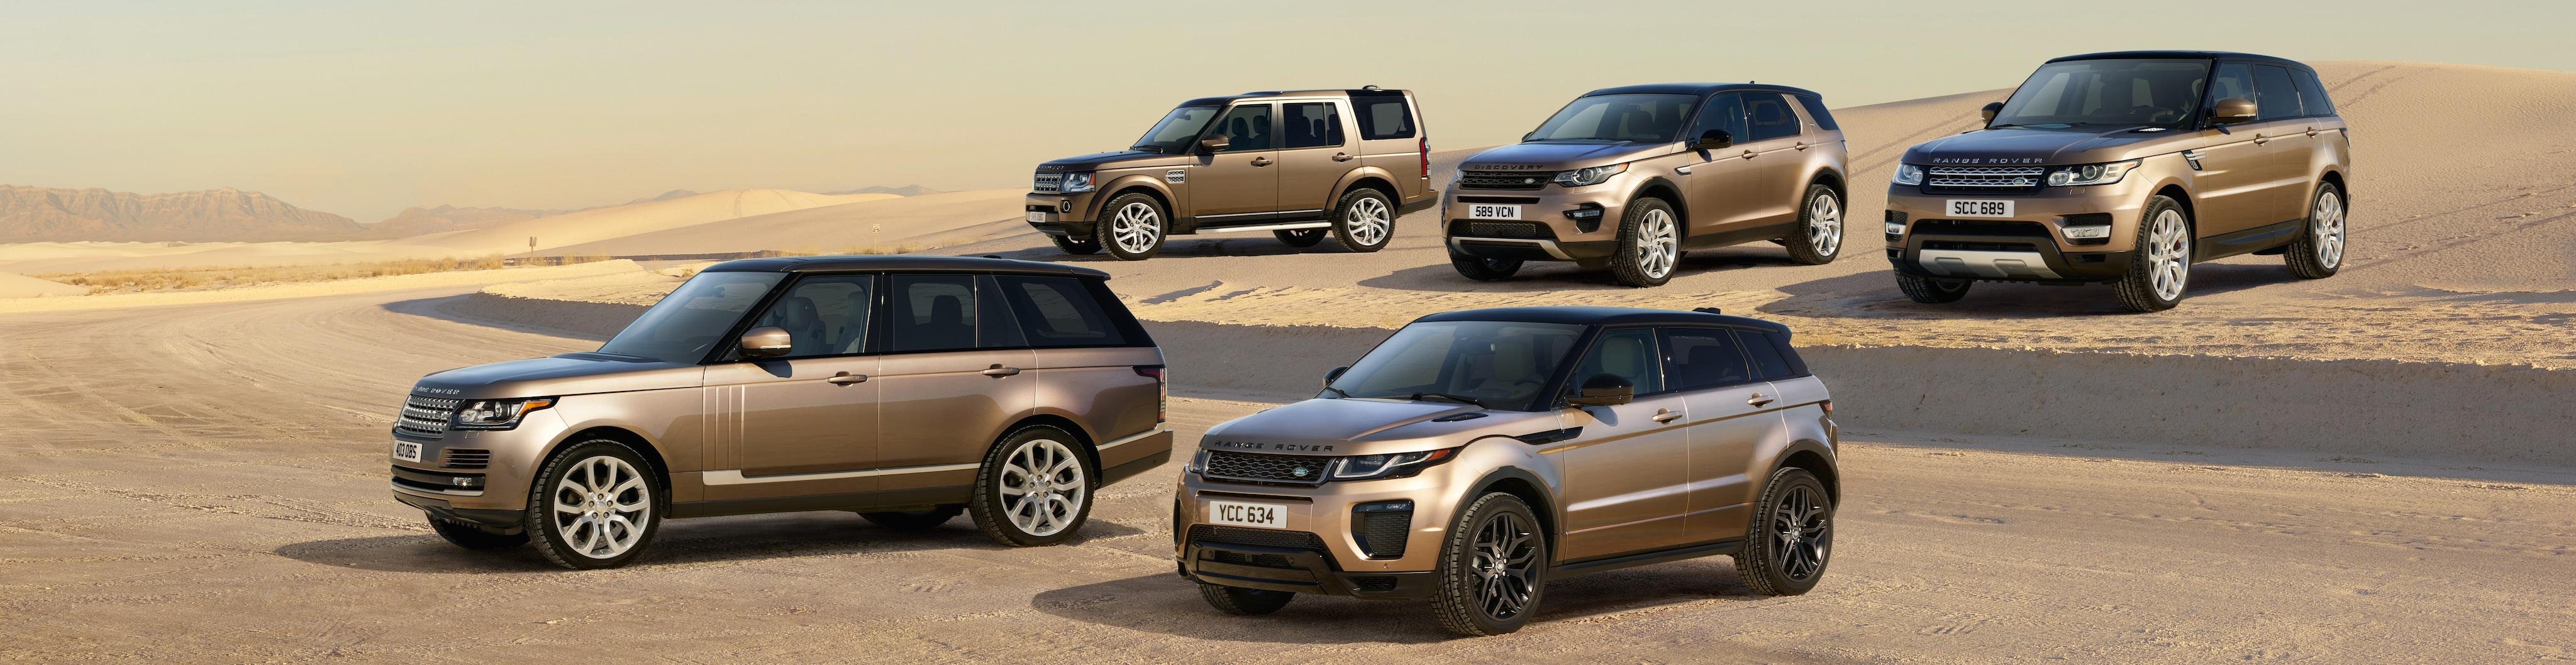 Range Rover Dealerships Land Rover Princeton New Land Rover Dealership In Princeton Nj